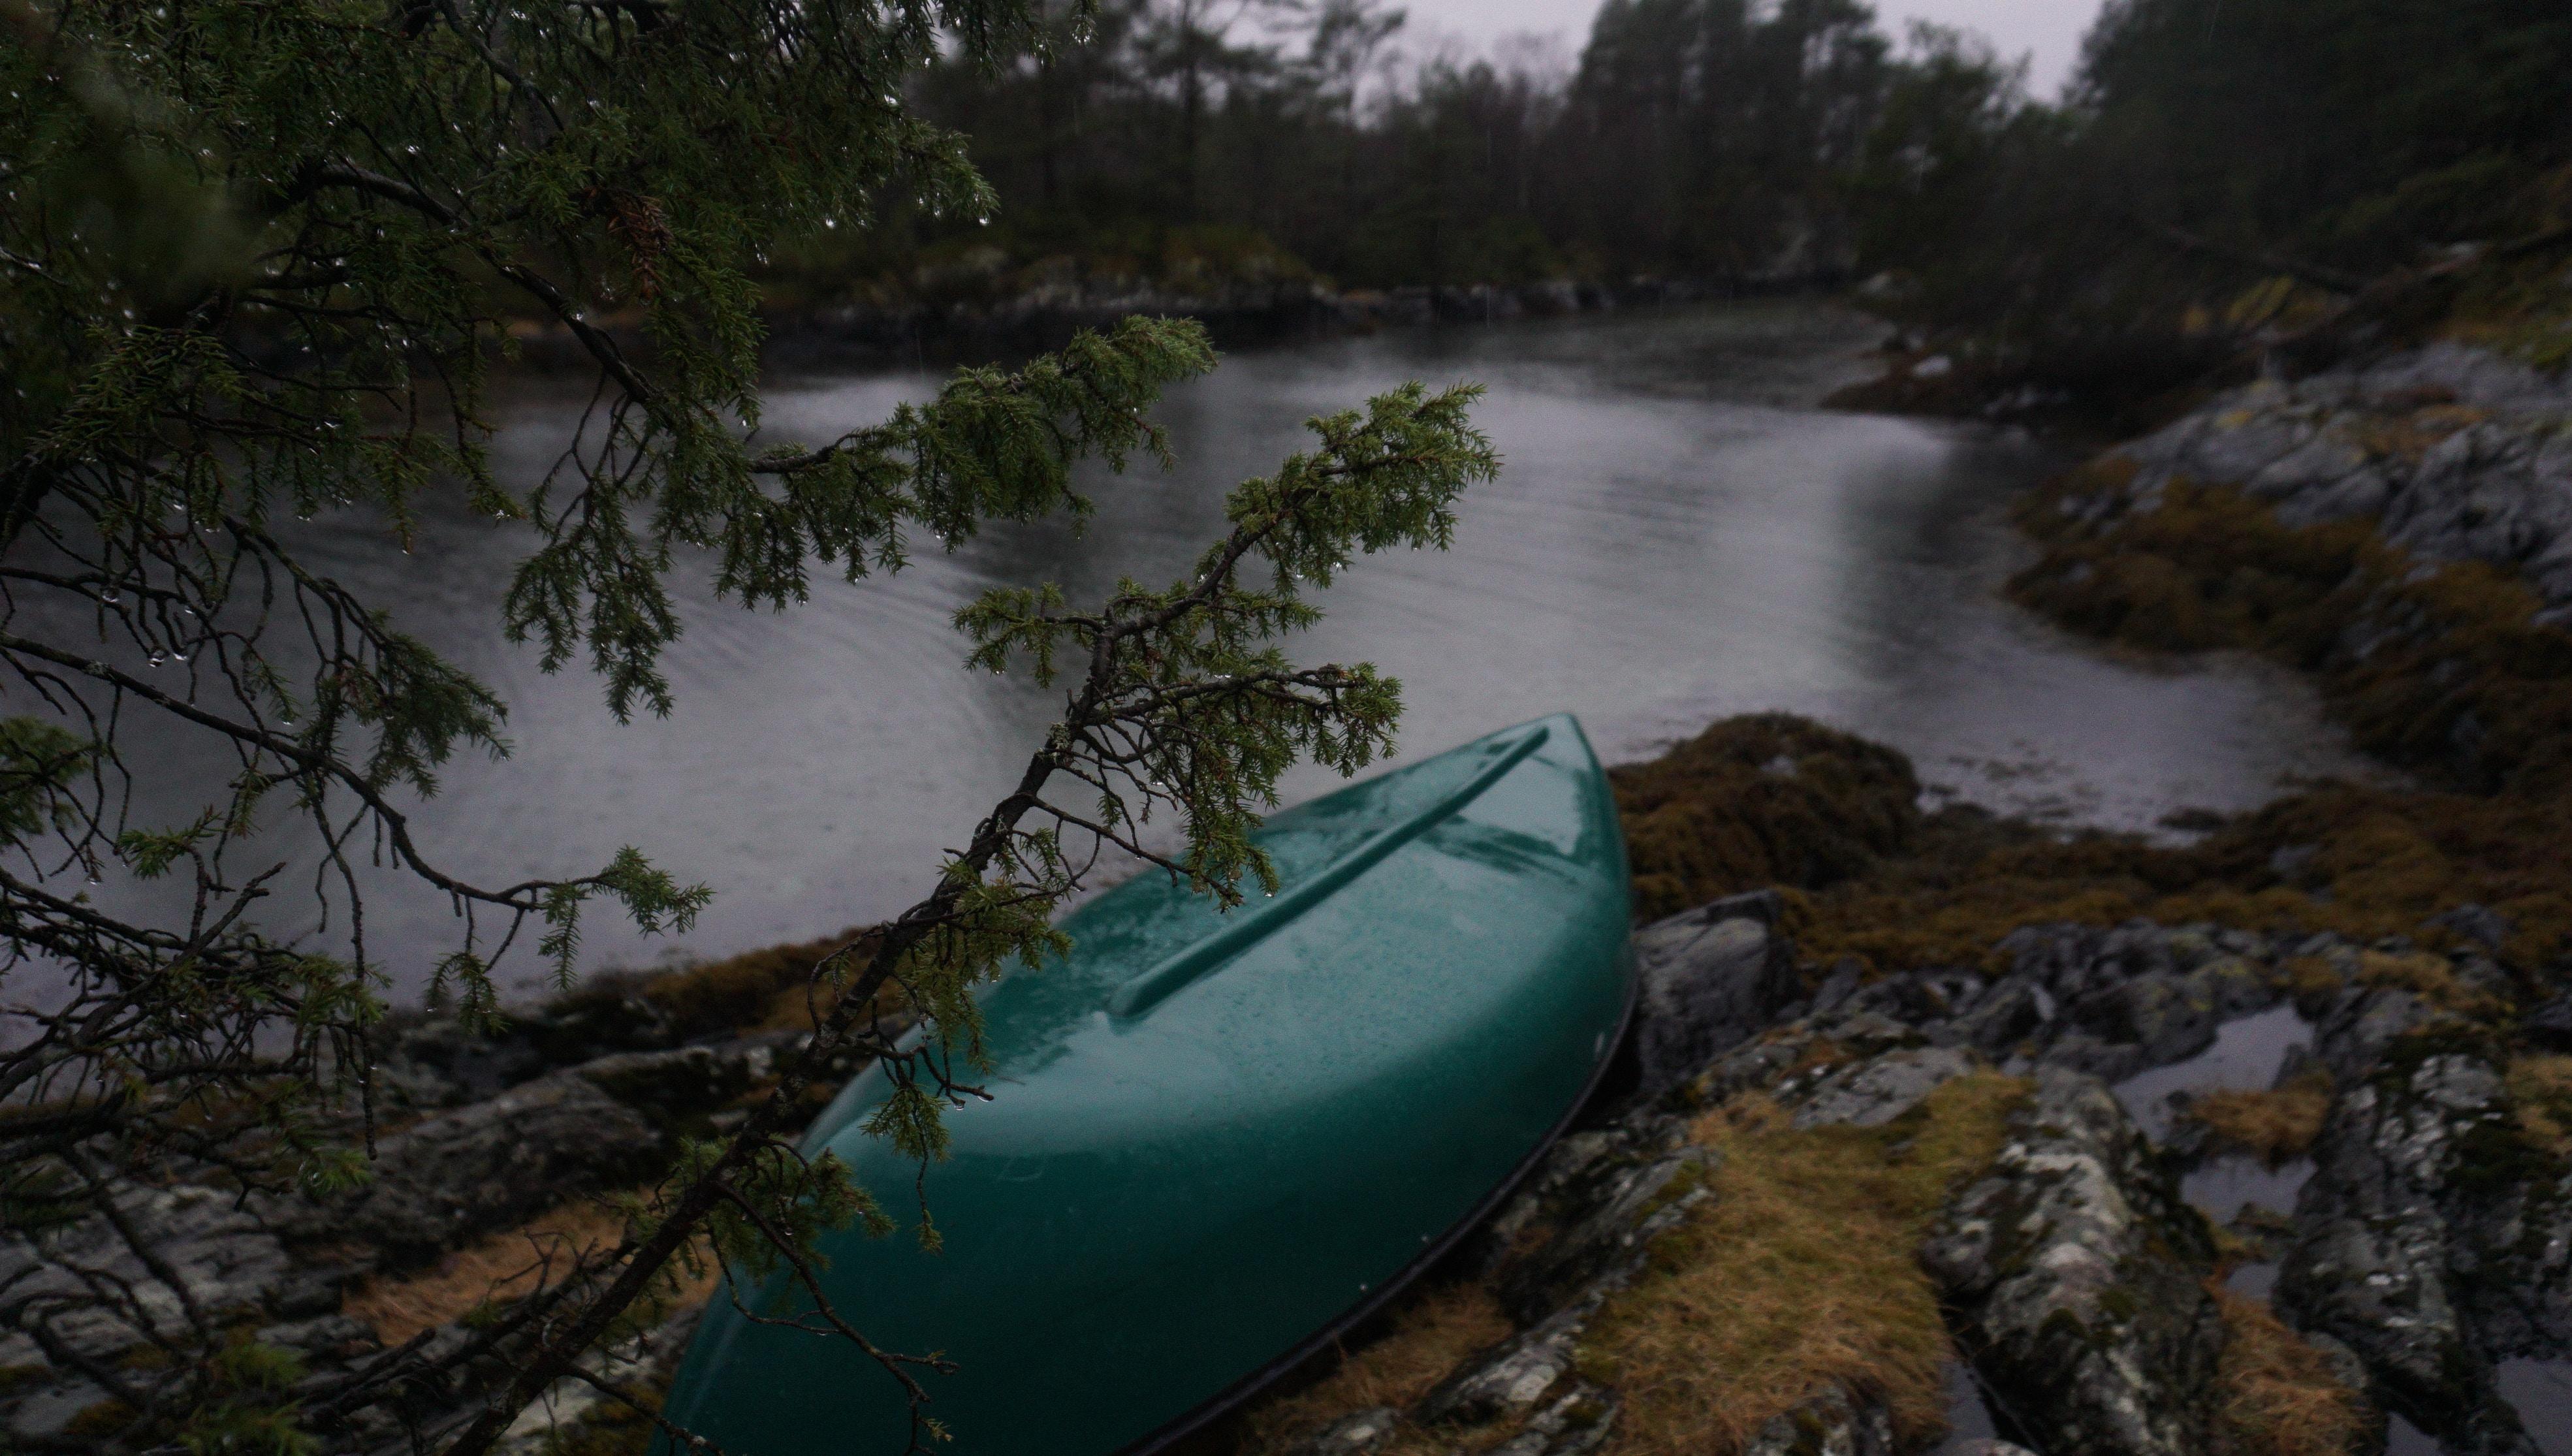 green kayak on rocky river